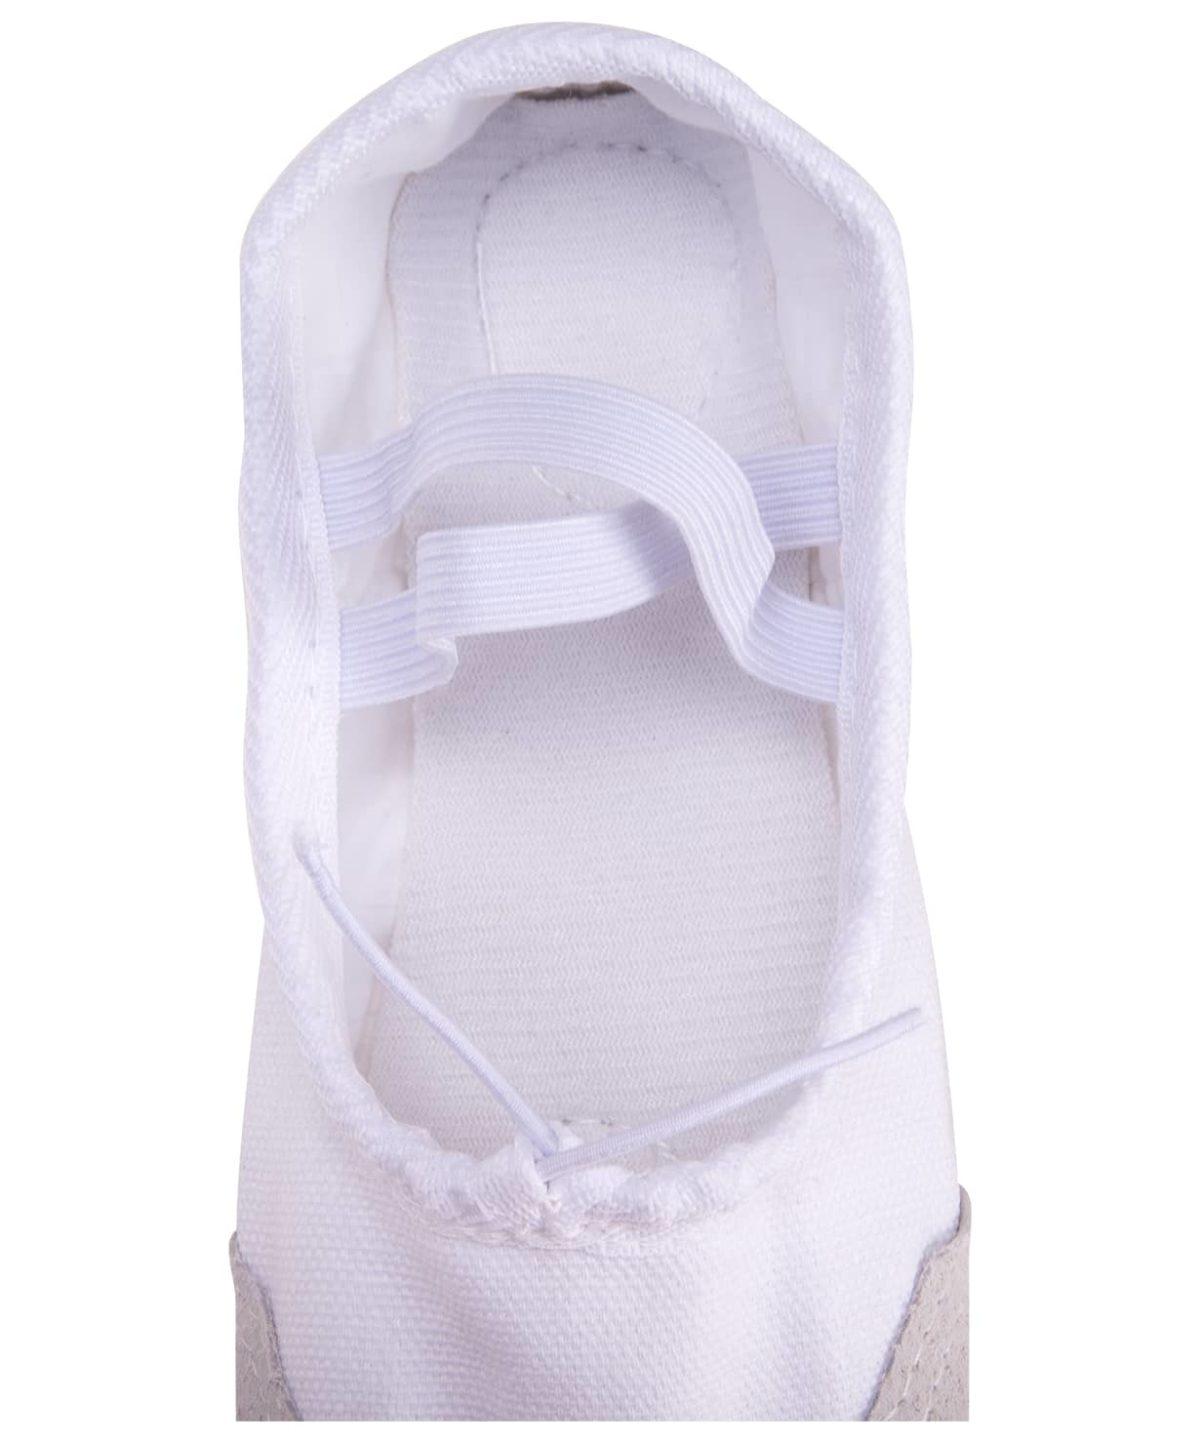 AMELY Балетки текстиль (24-26) SL-01: белый - 2